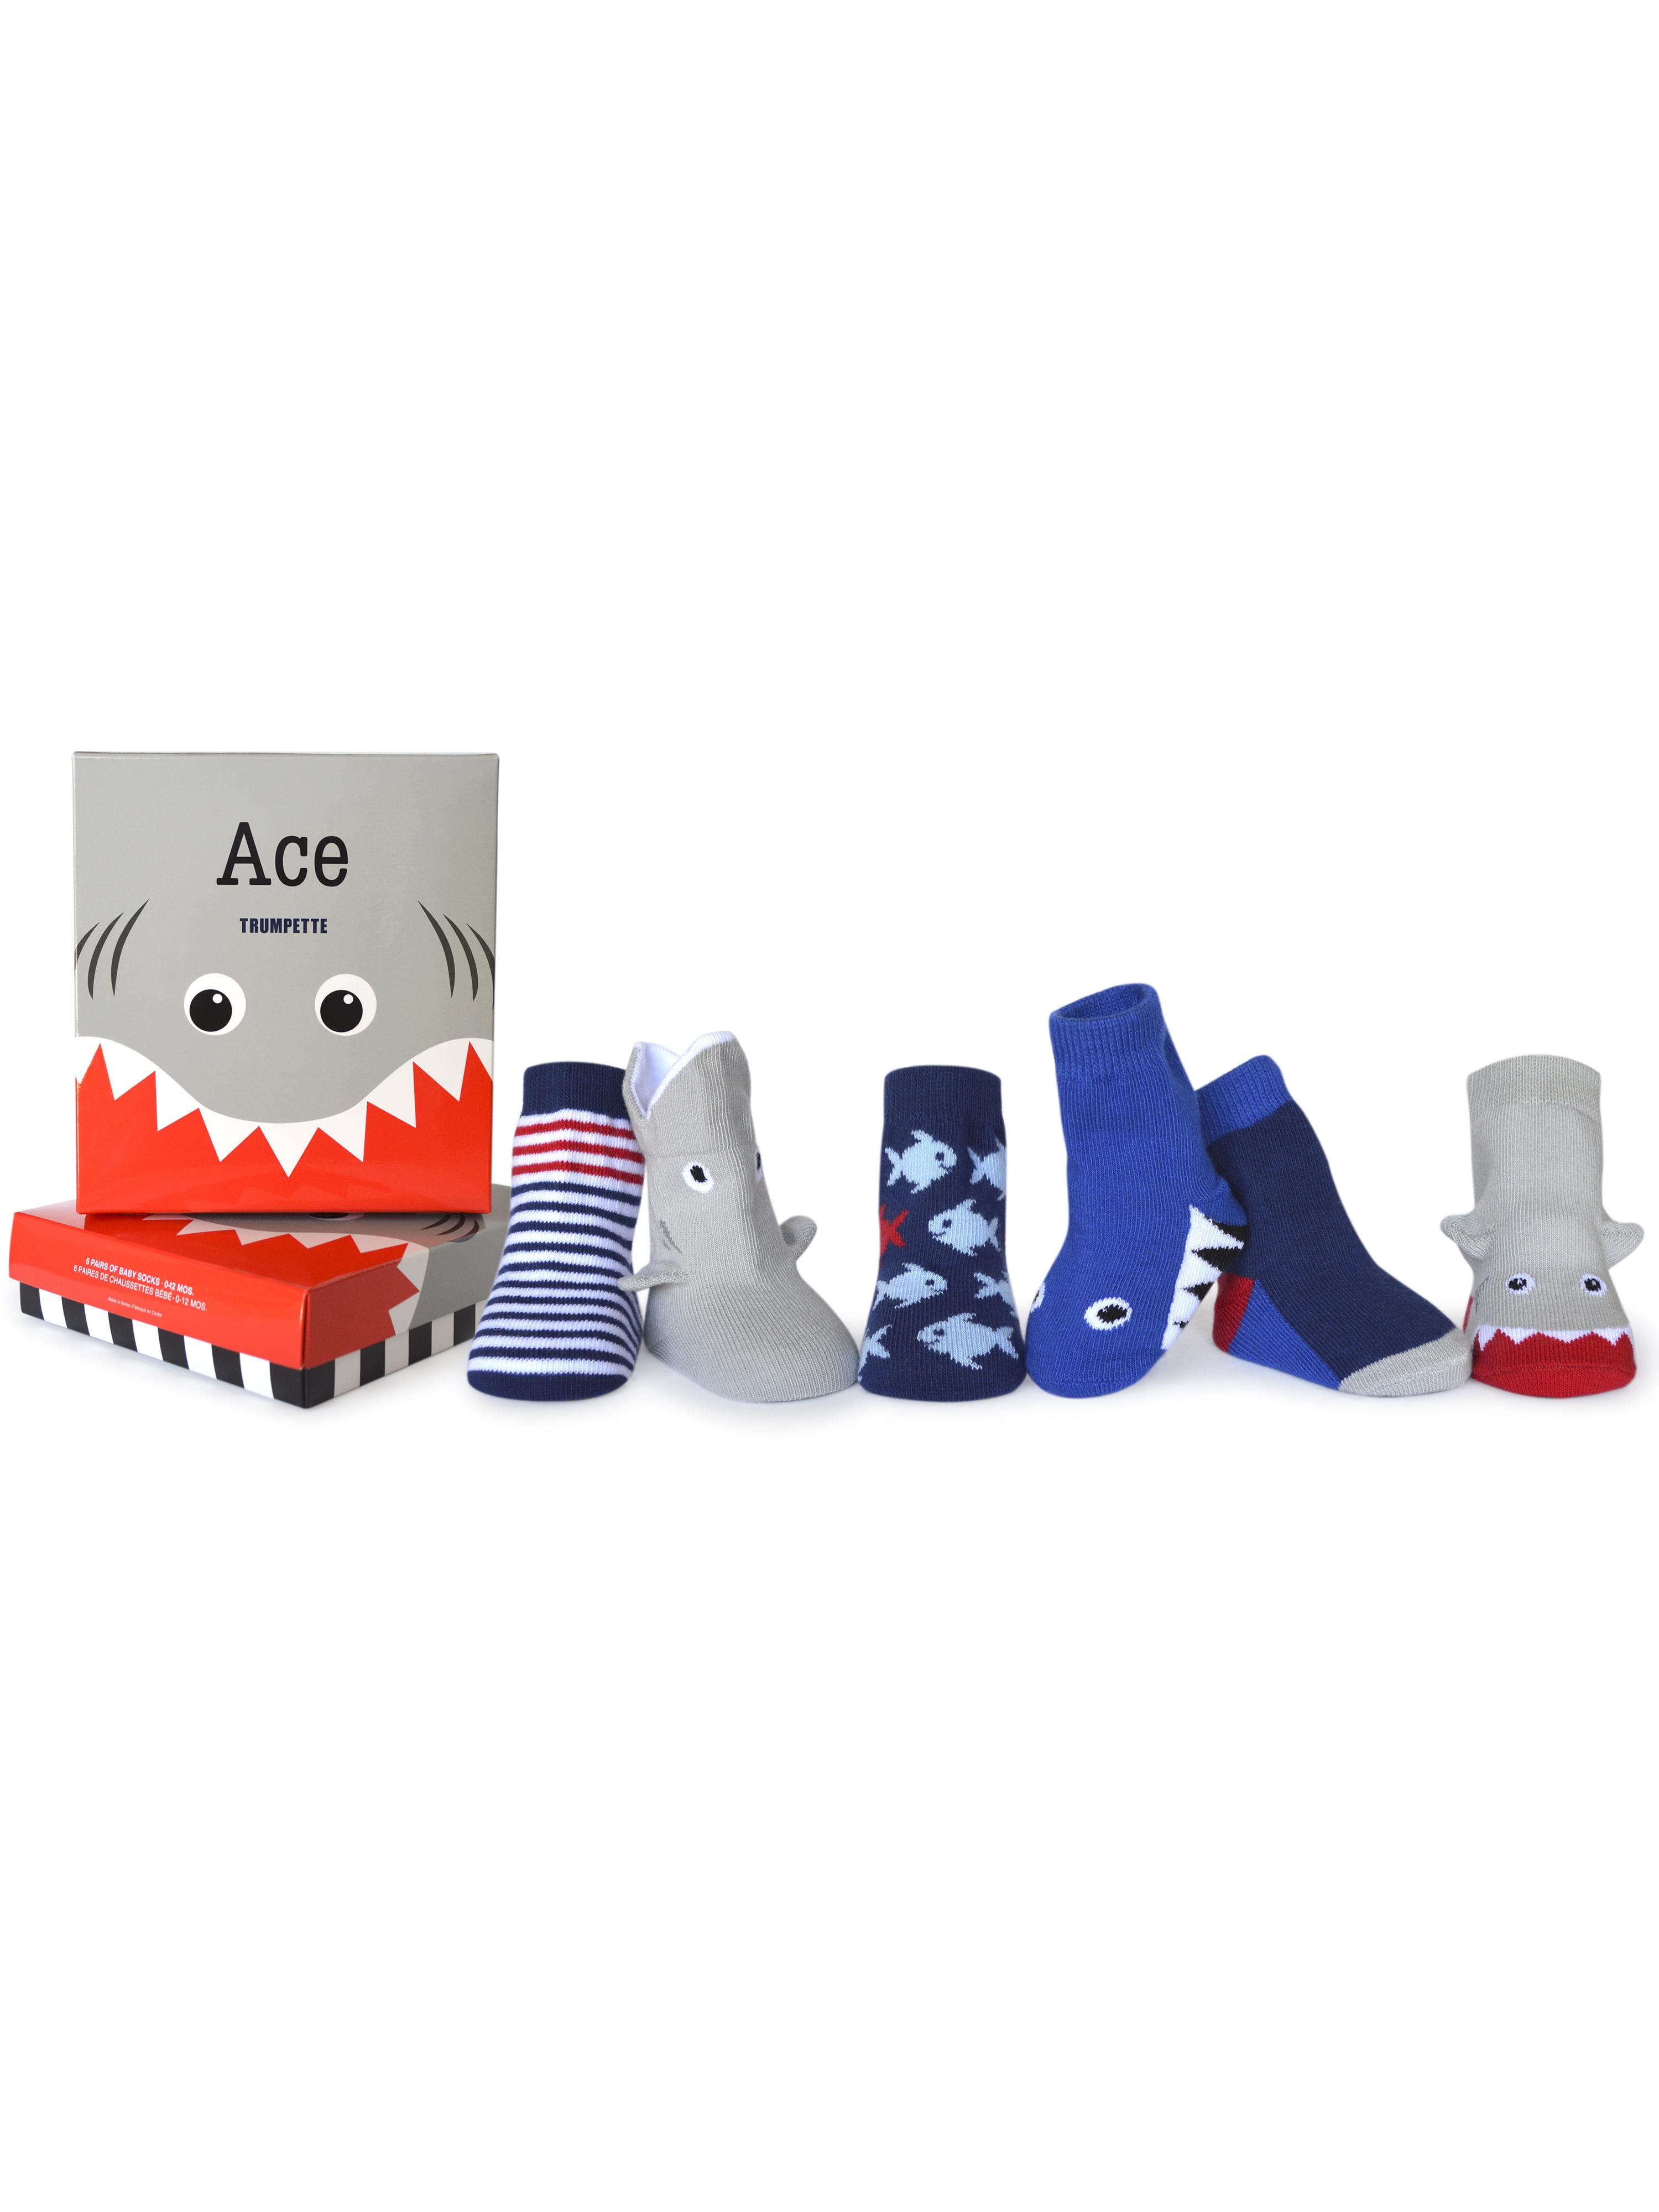 Trumpette Little Adventurer 0-12M Baby Accessories Set of 6 Socks